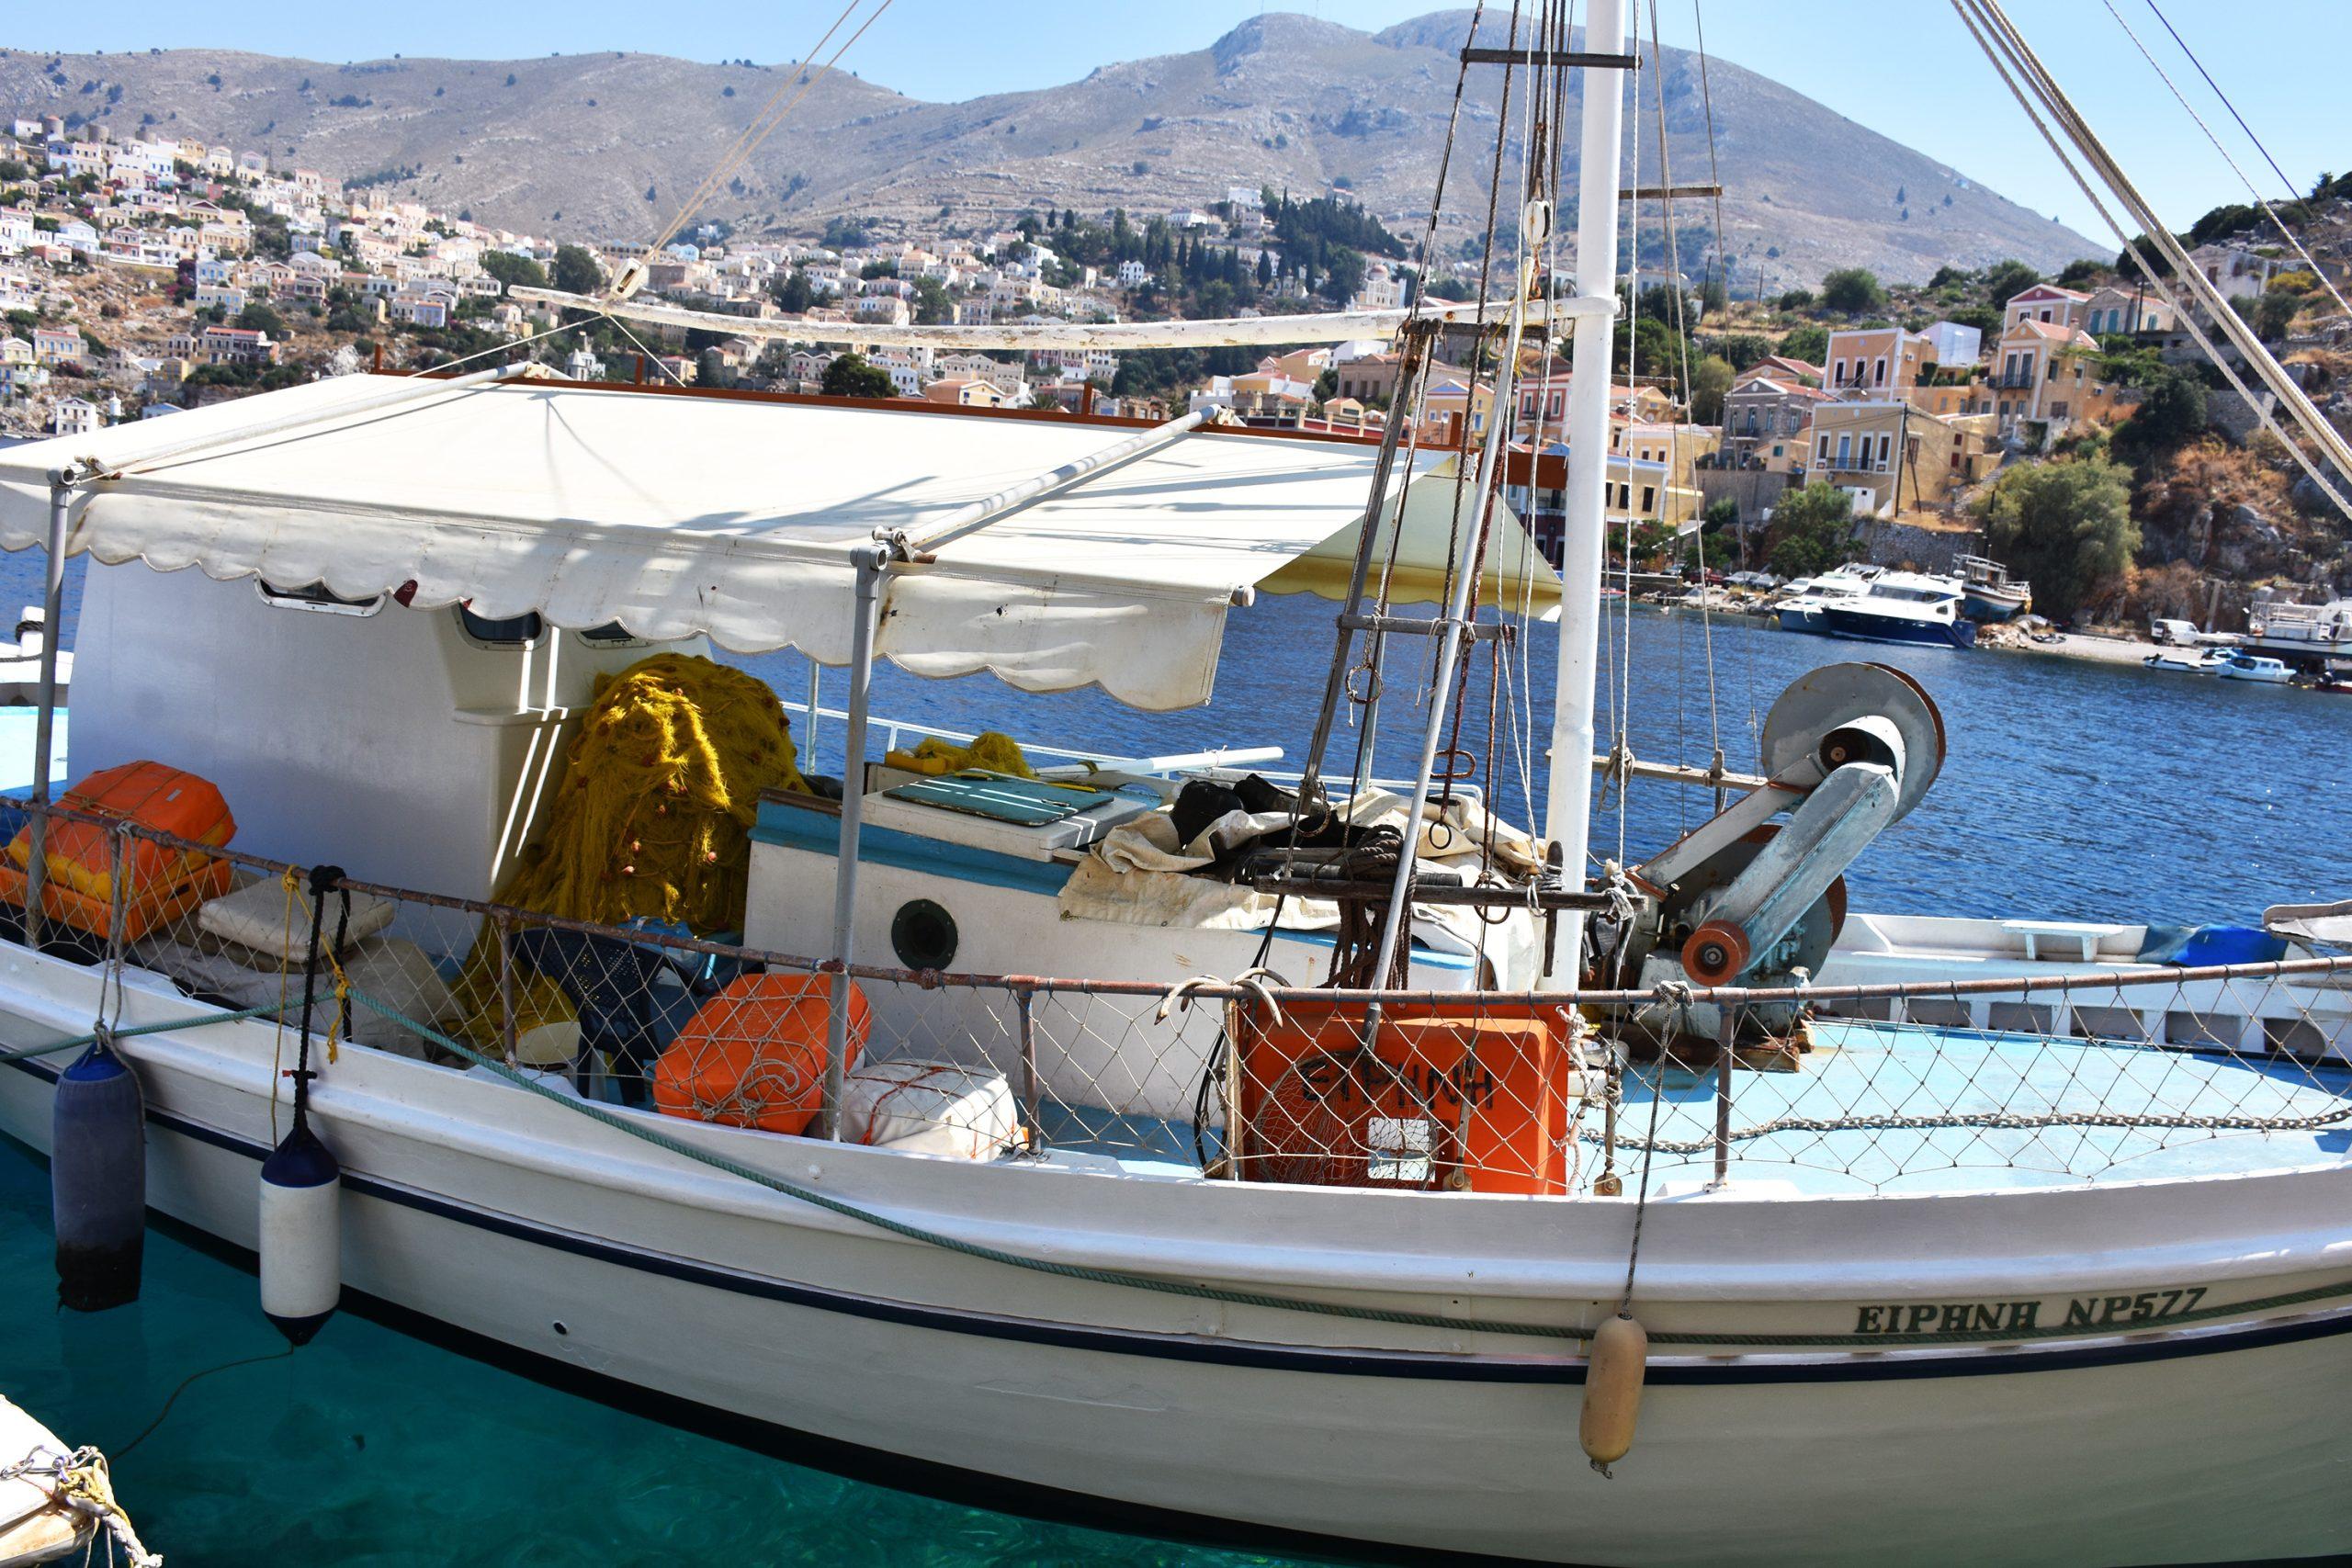 A fish boat in Simi's port in Greece